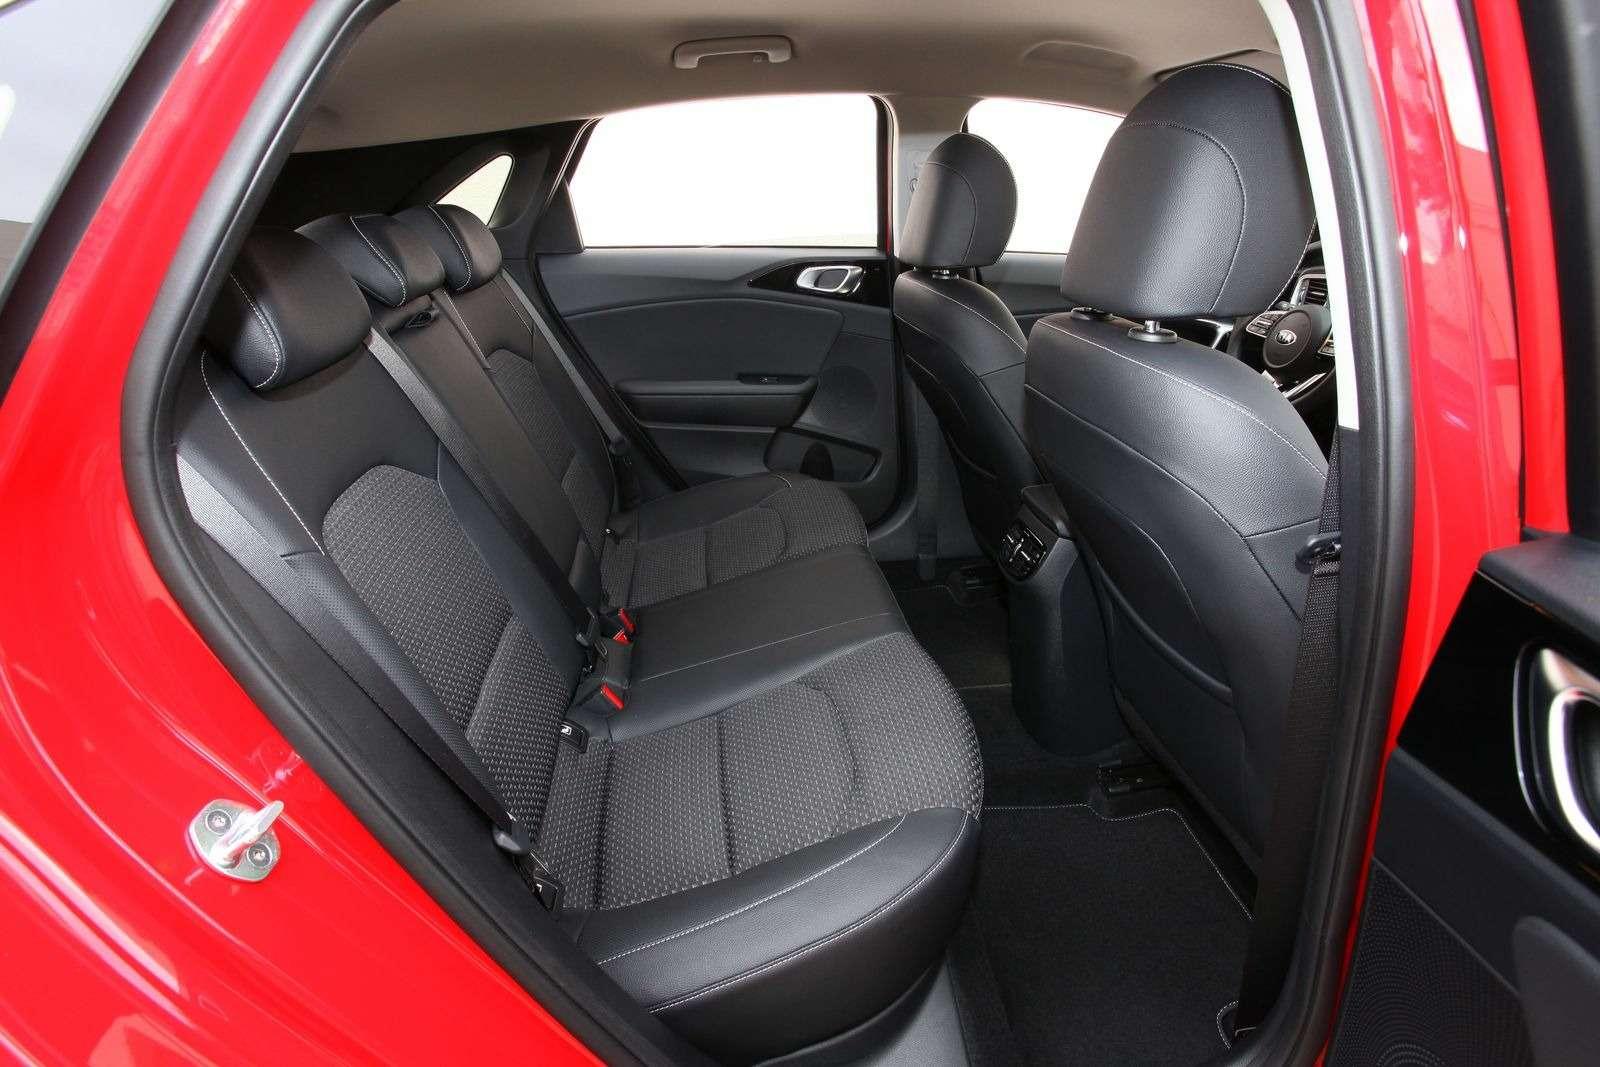 Новый Kia Ceed: началось производство вРоссии. Цен пока нет— фото 887517